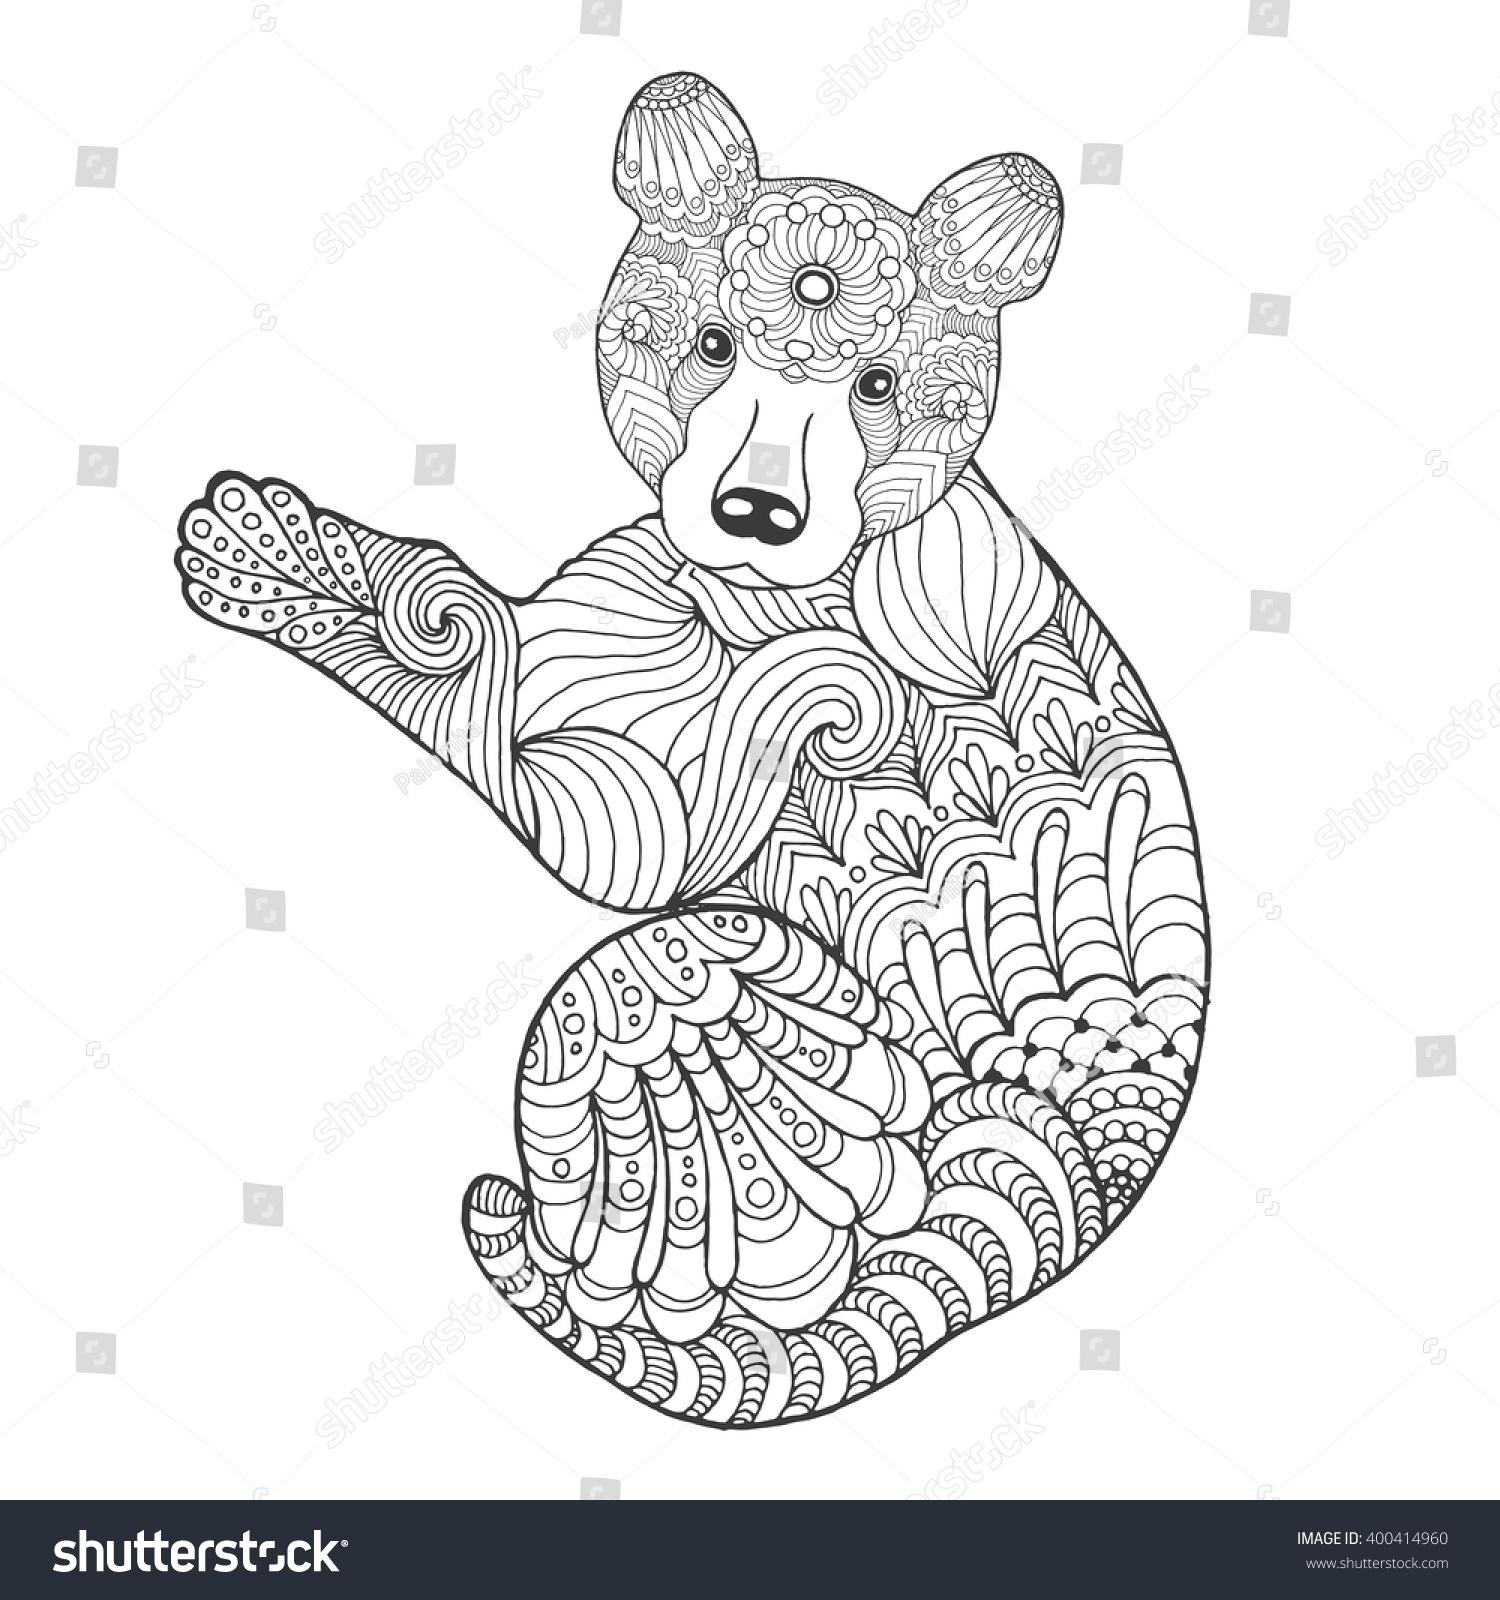 Cute Bear. Black White Hand Drawn Doodle Animal. Ethnic ...